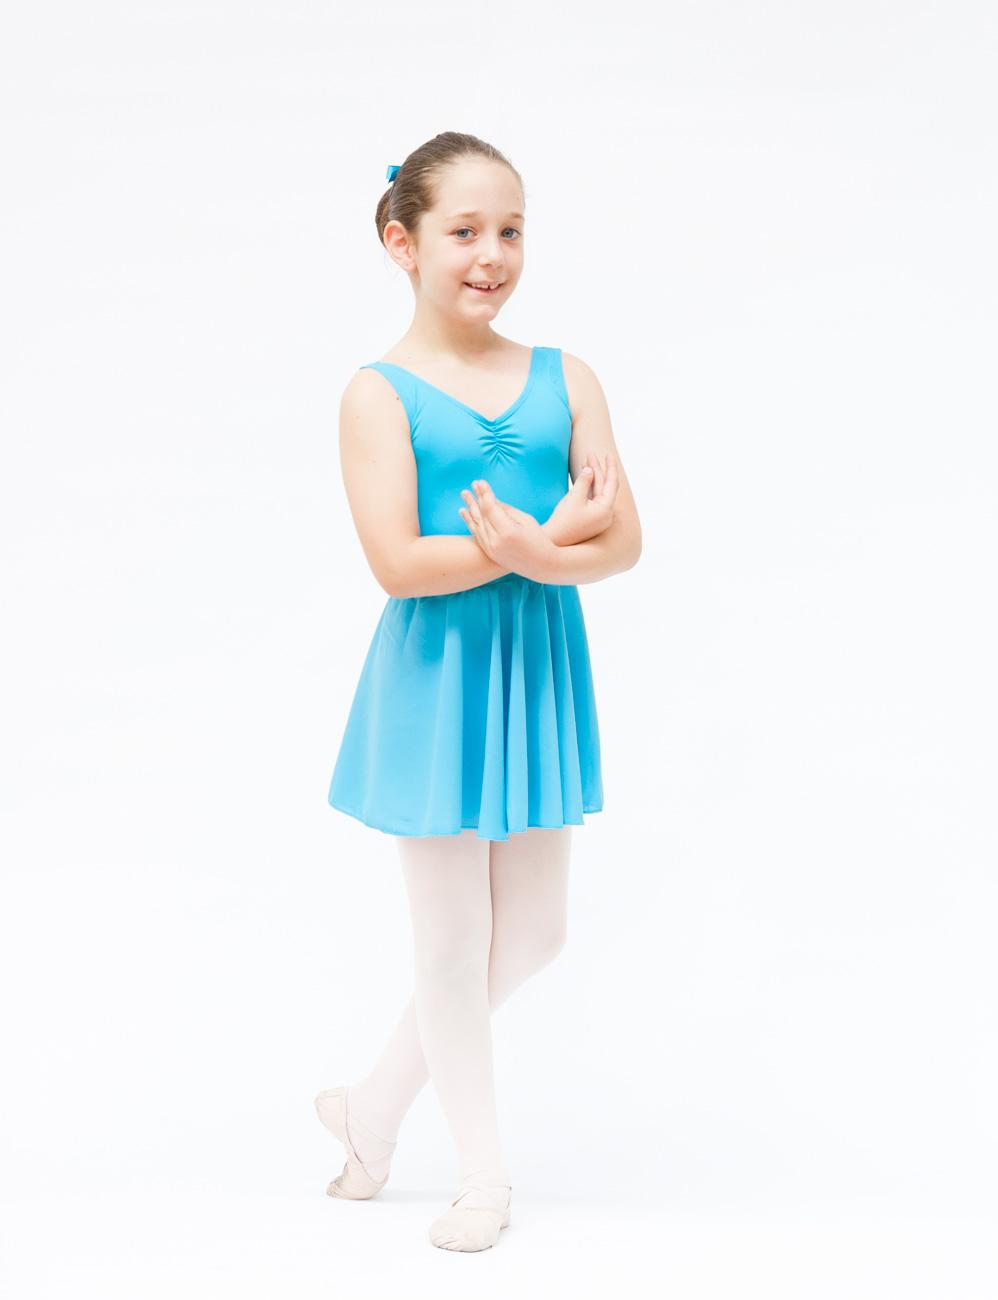 Grade 1 and 2 Mathis Dance Studios uniform